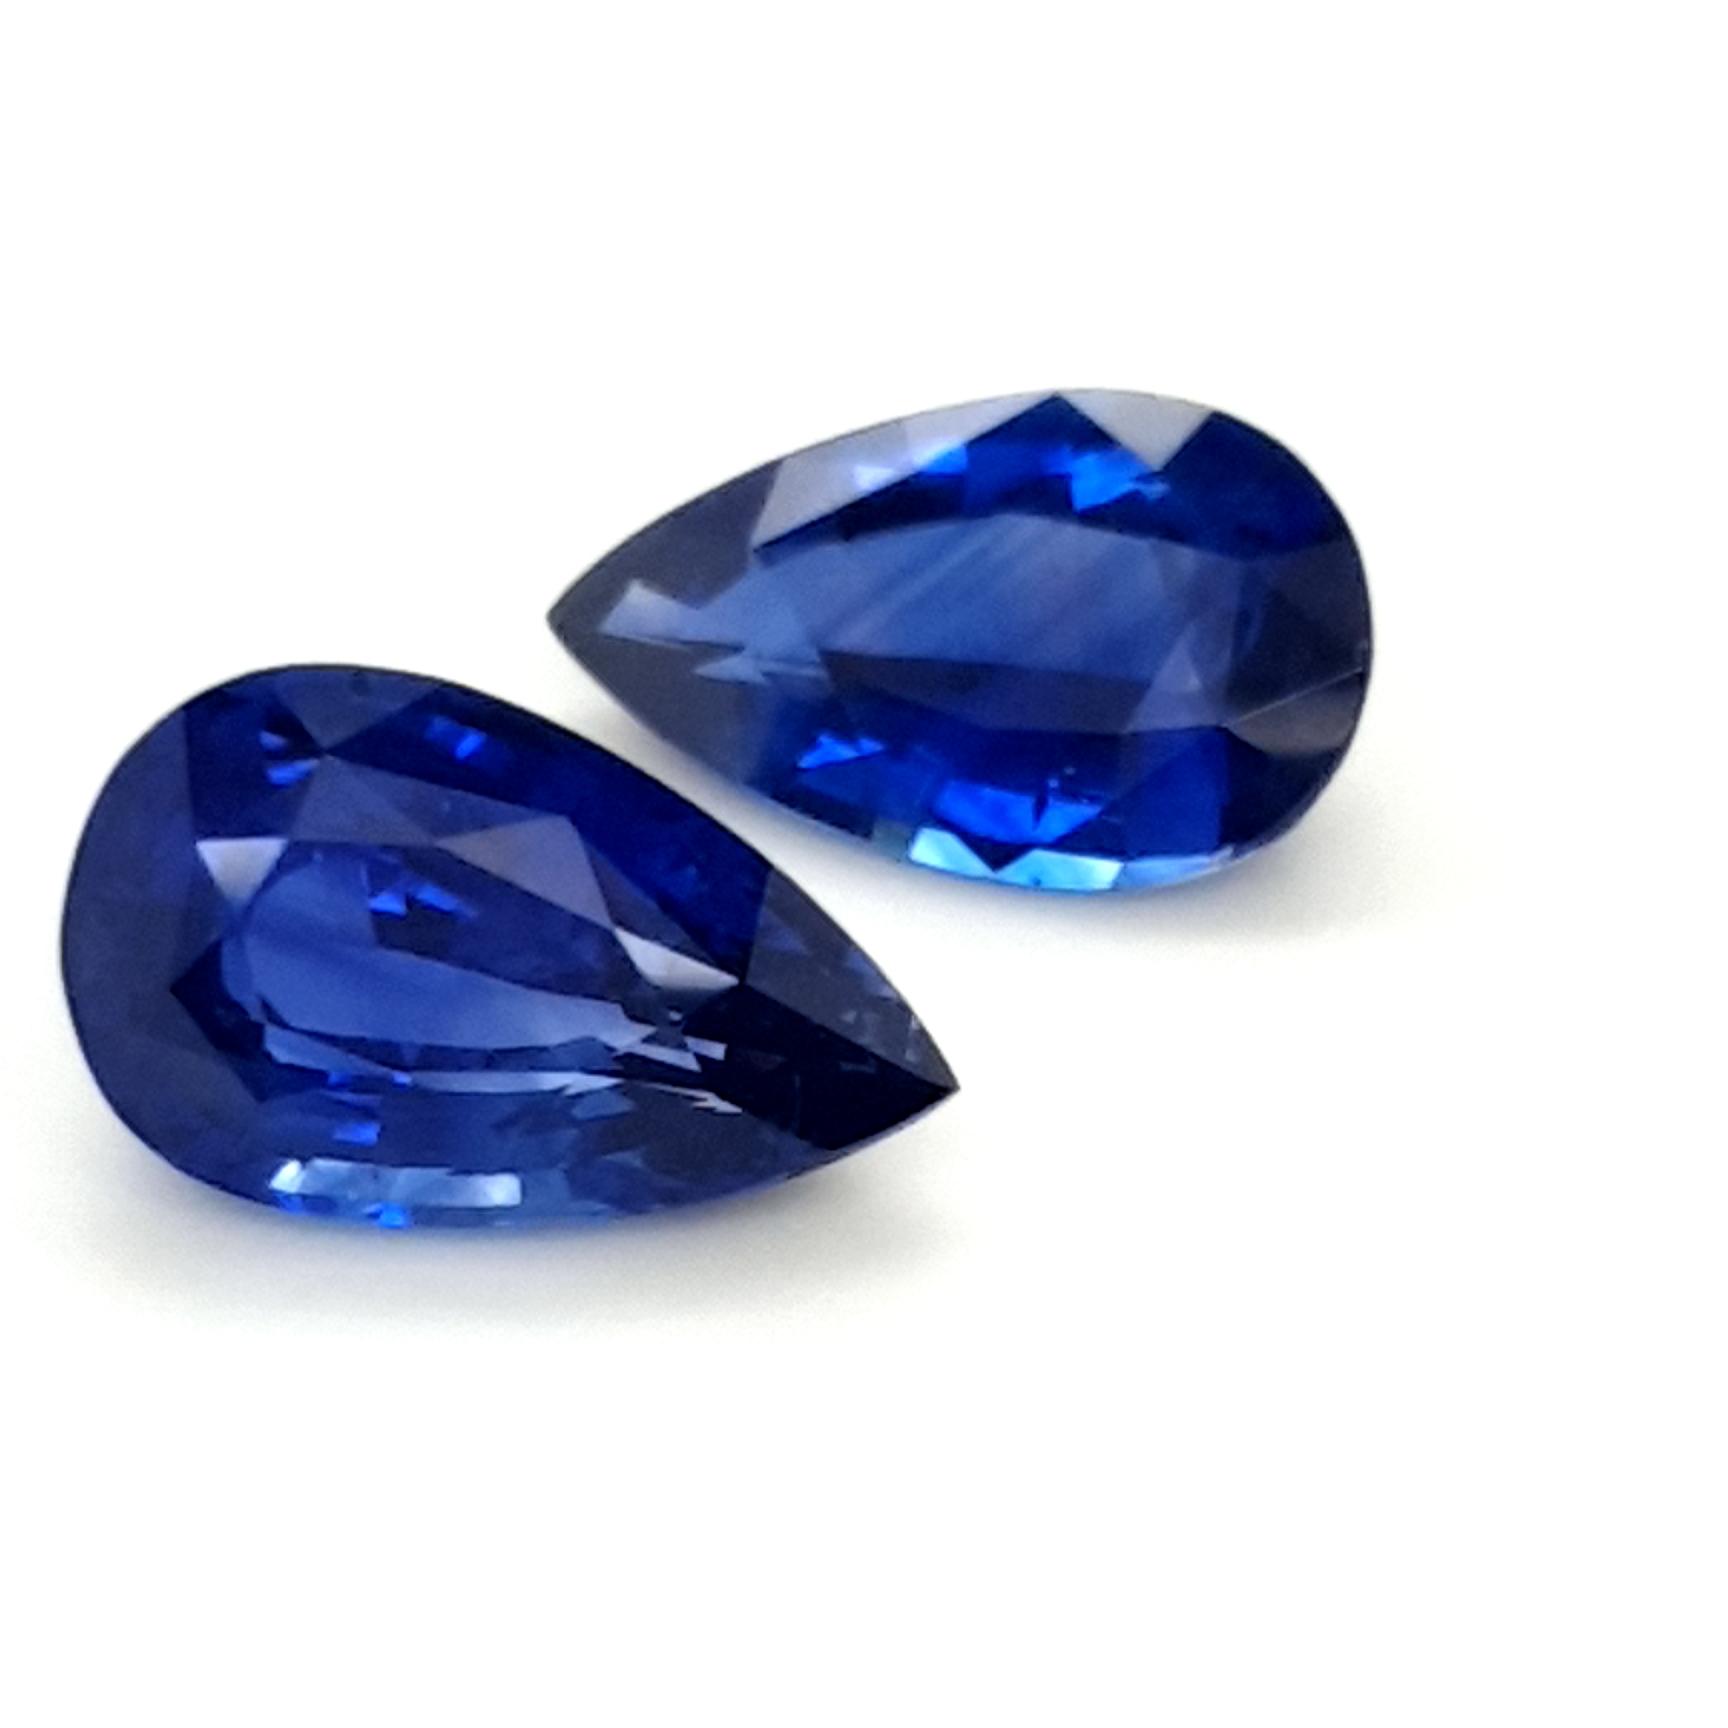 9,88ct. Pair Sapphire PearShape RoyalBlue SAB19D6 ClaudiaHamann__2021-06-03-10-46-02